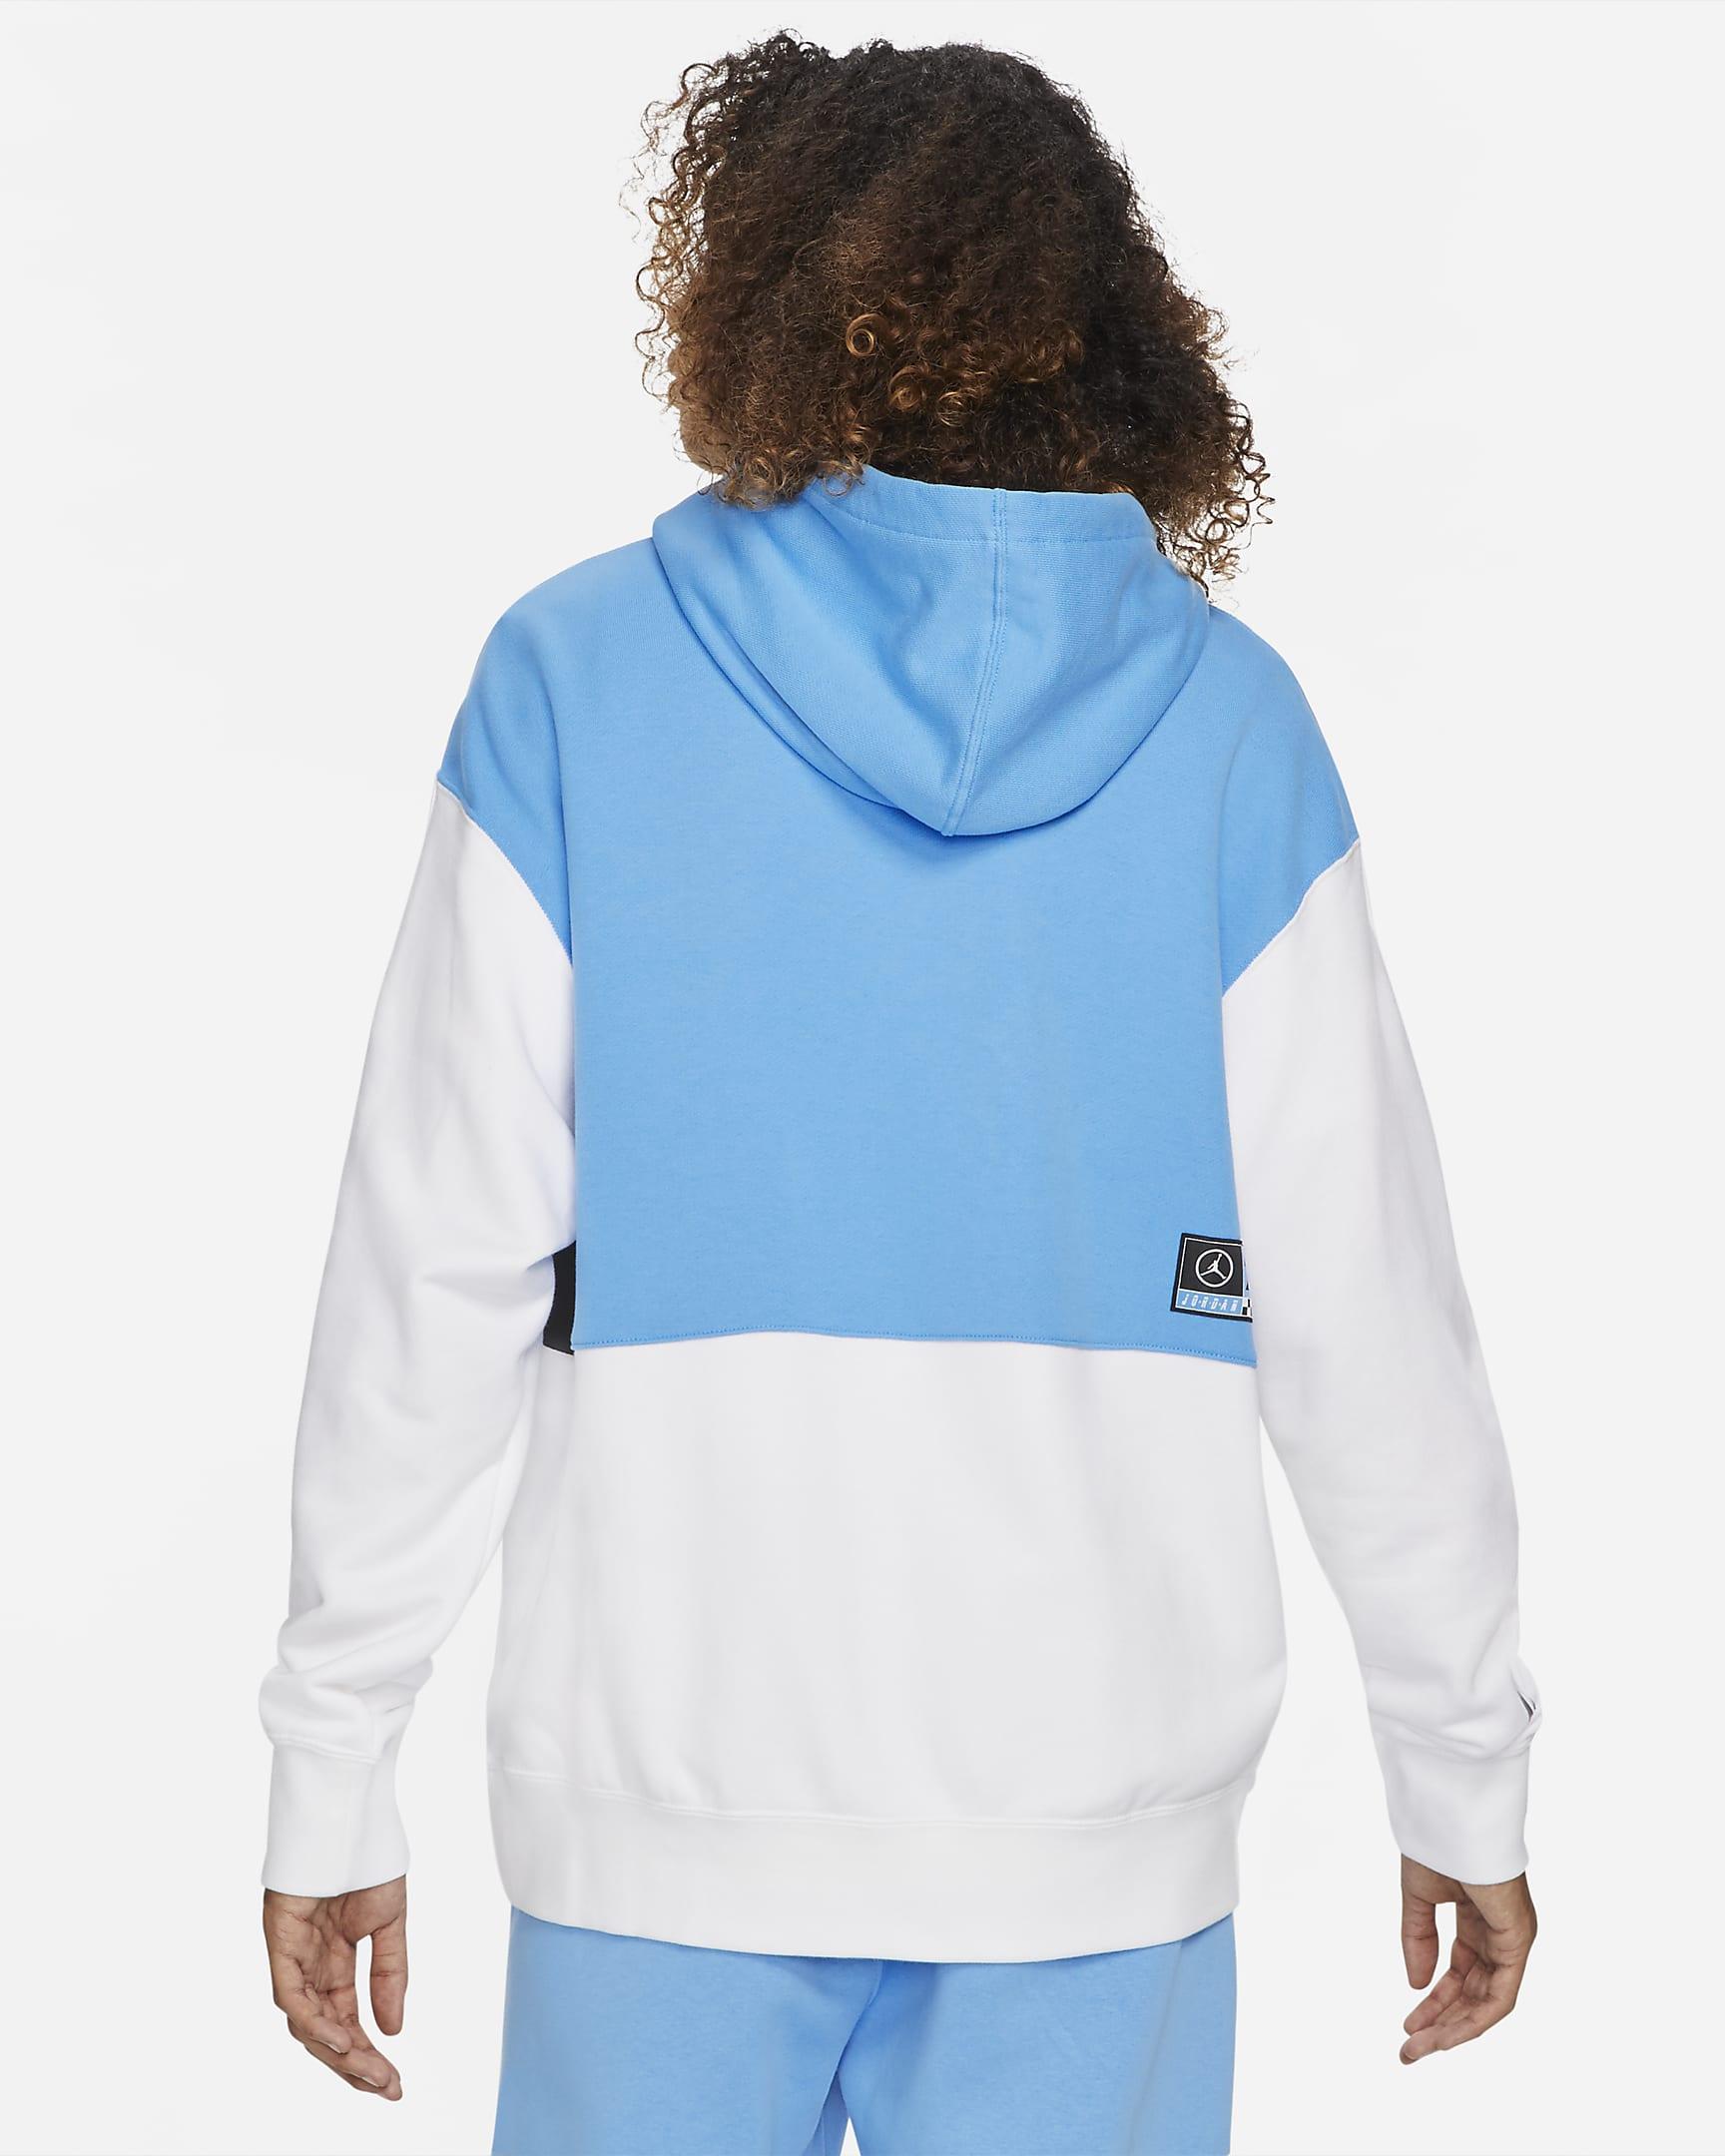 jordan-sport-dna-mens-pullover-hoodie-rMj8Rw-1